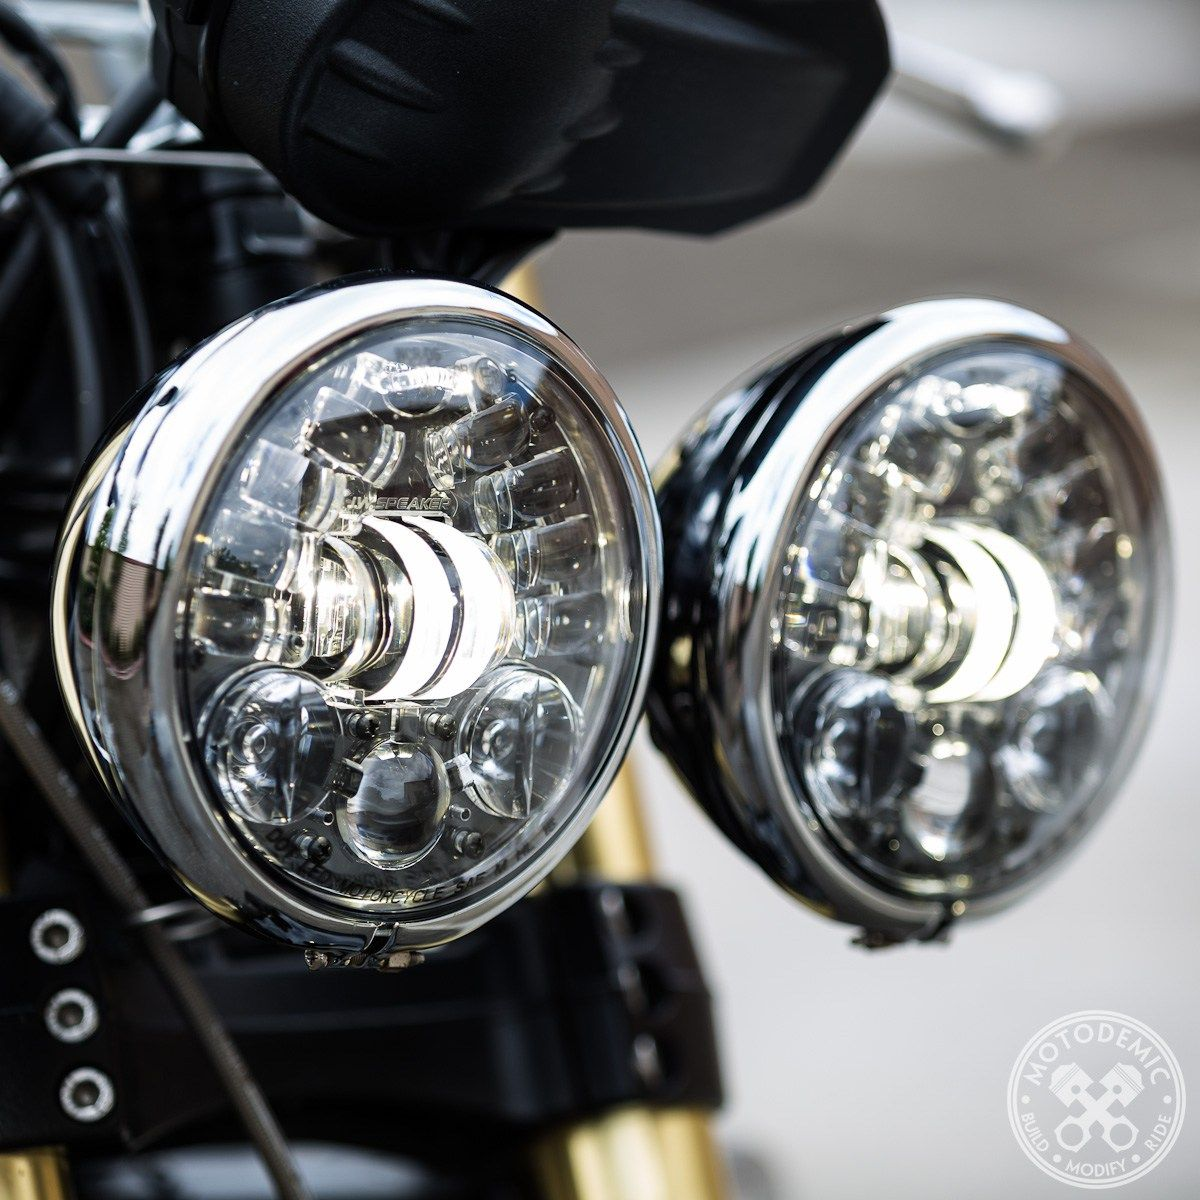 Headlight Modified Headlight Fog Lamp Auto Light Bulbs Car Motorcycle Motorbike